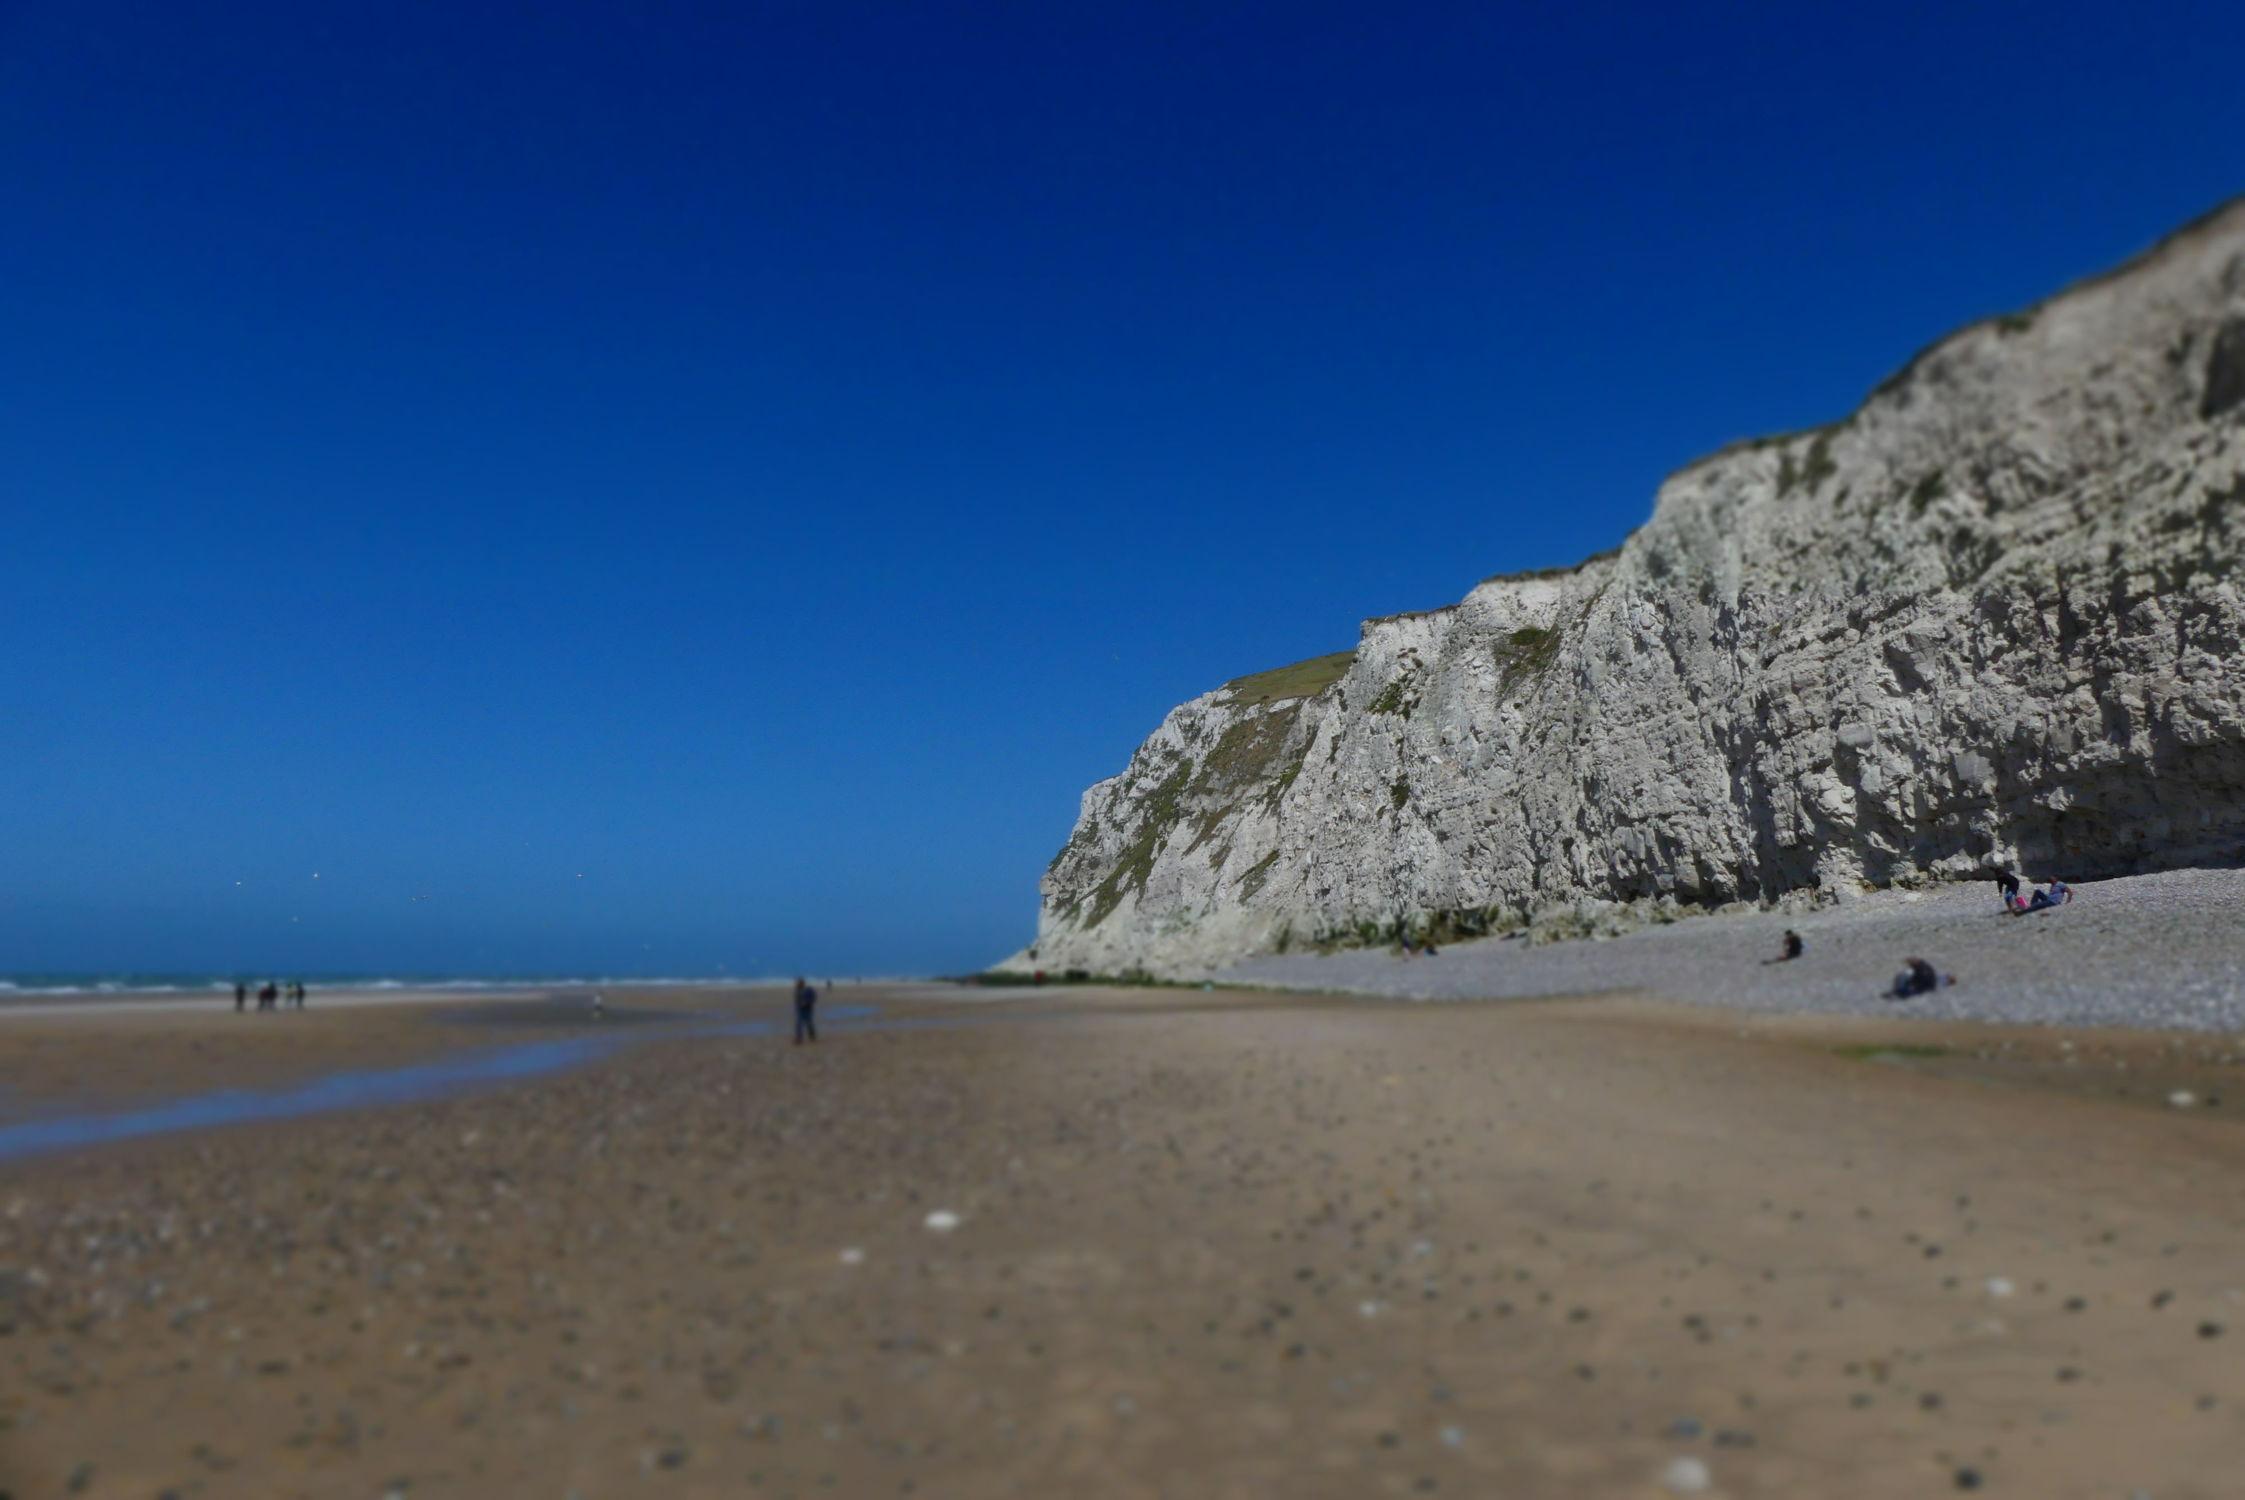 Bild mit Felsen, Frankreich, Meer, Blauer Himmel, Küste, Felsenküste